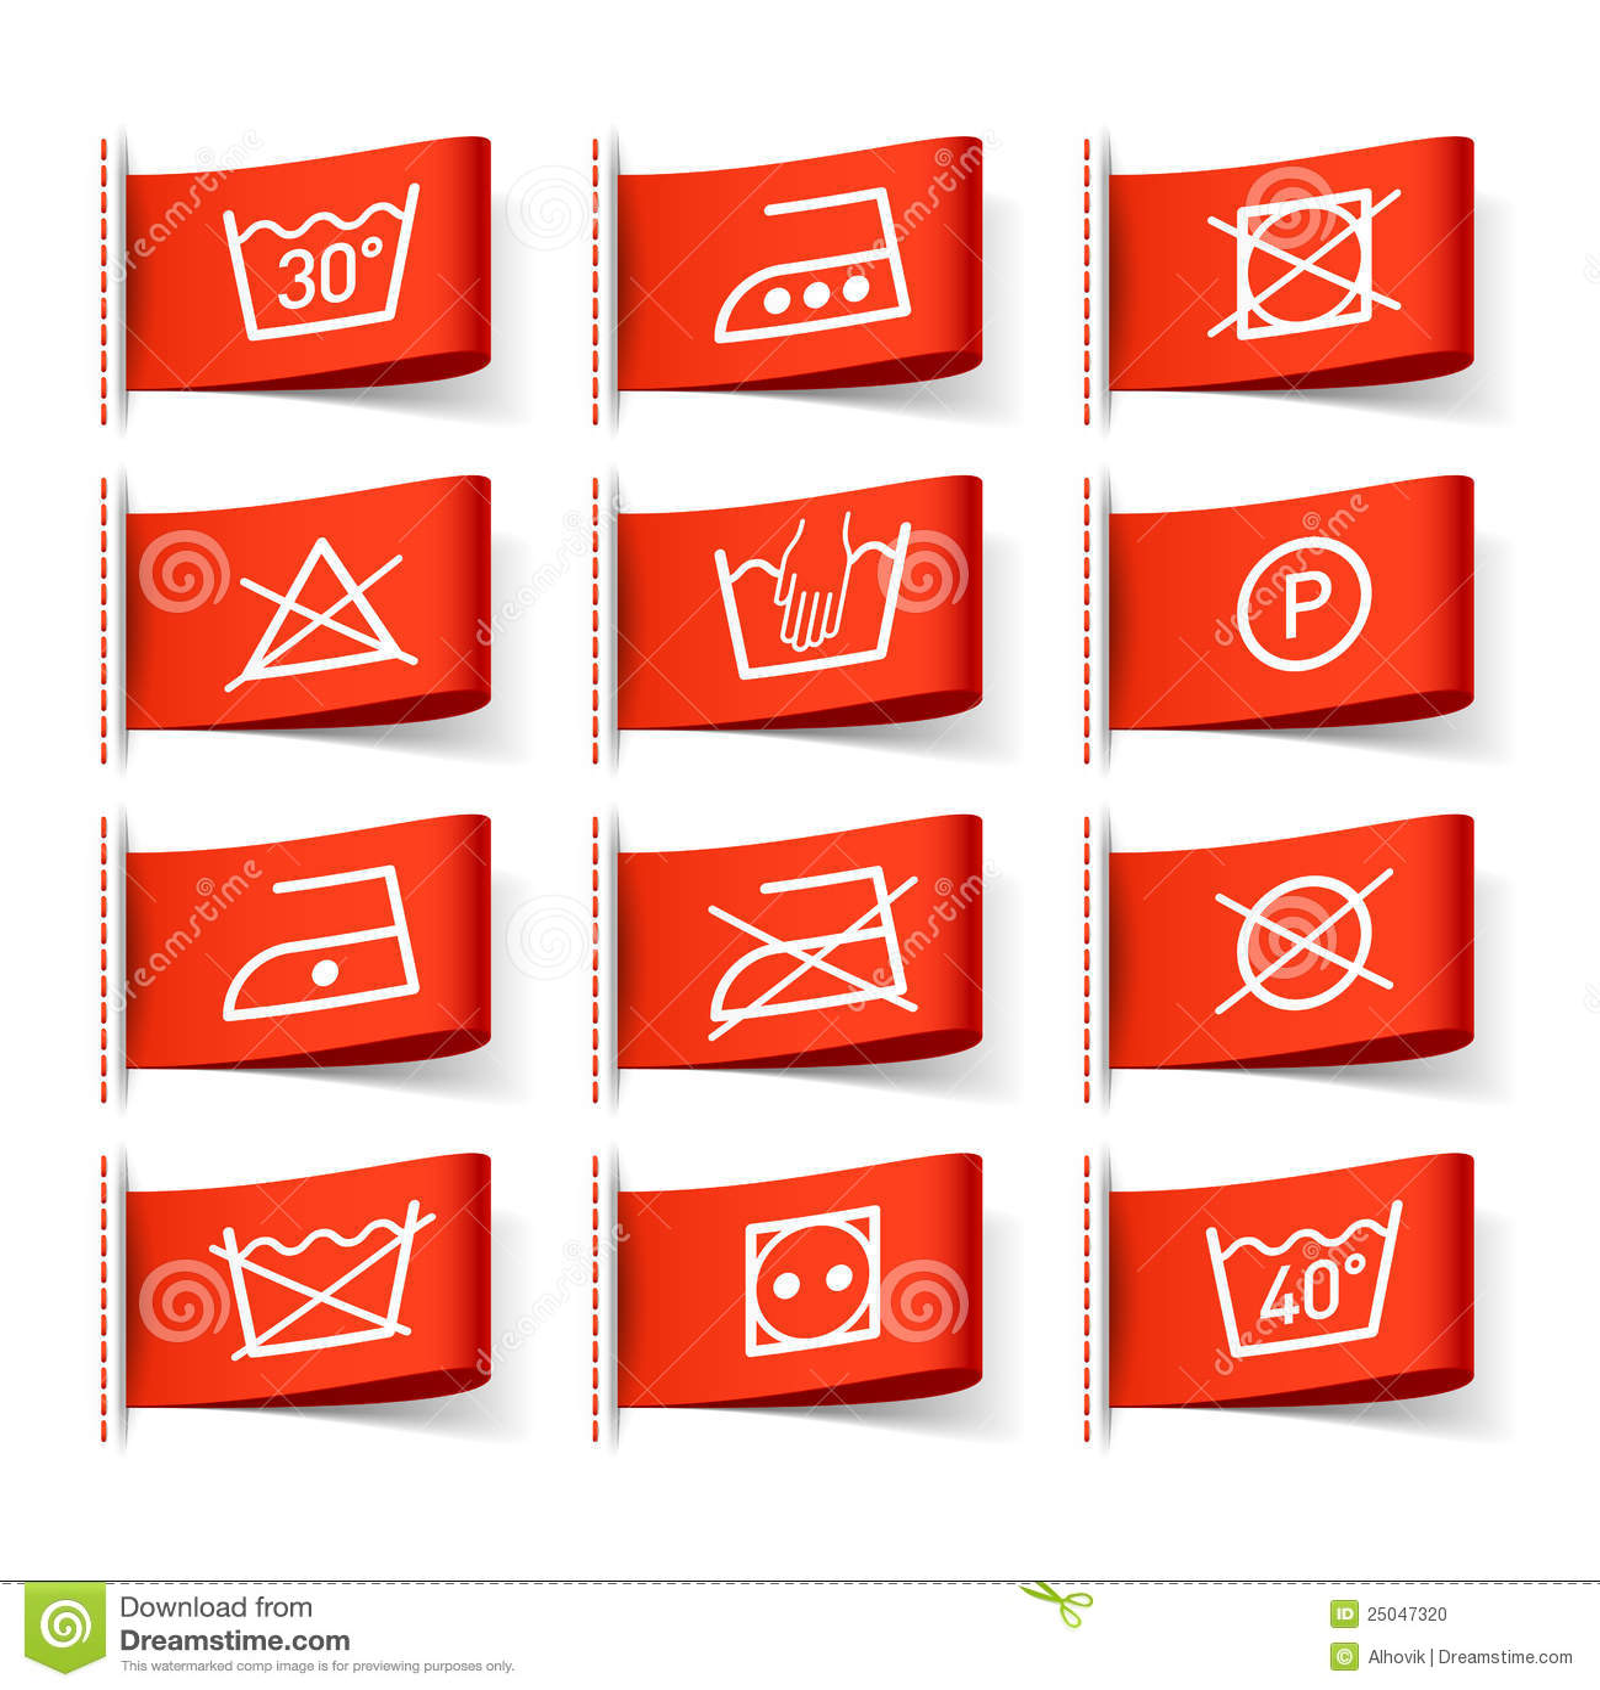 Washing Symbols On Clothing Labels Stock Vector Illustration Of